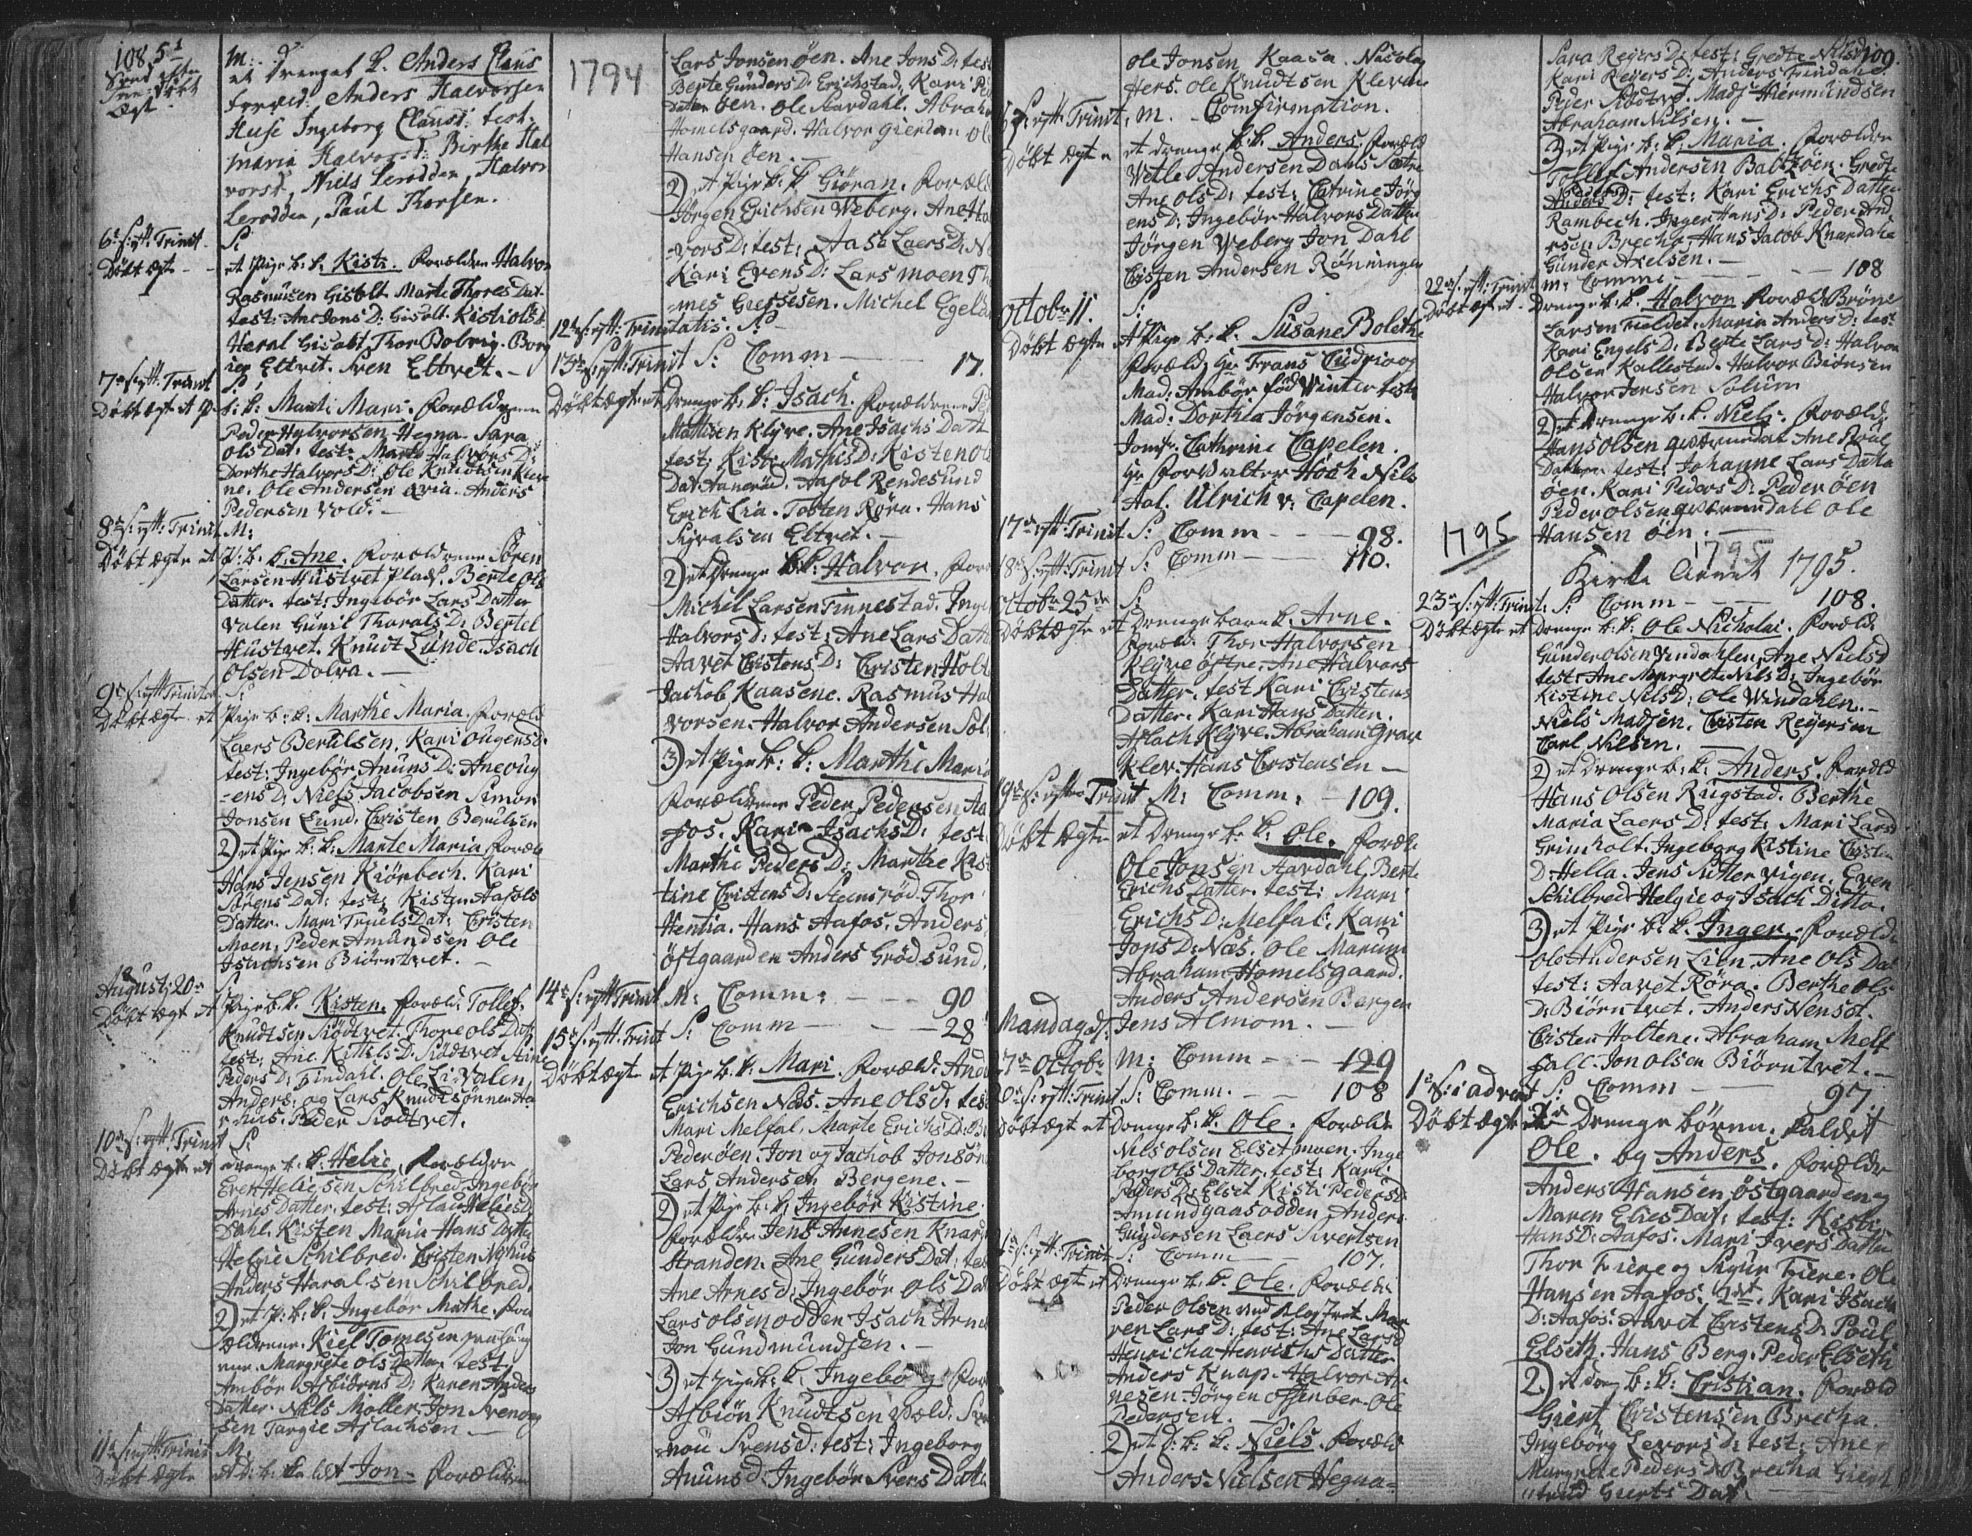 SAKO, Solum kirkebøker, F/Fa/L0003: Ministerialbok nr. I 3, 1761-1814, s. 108-109